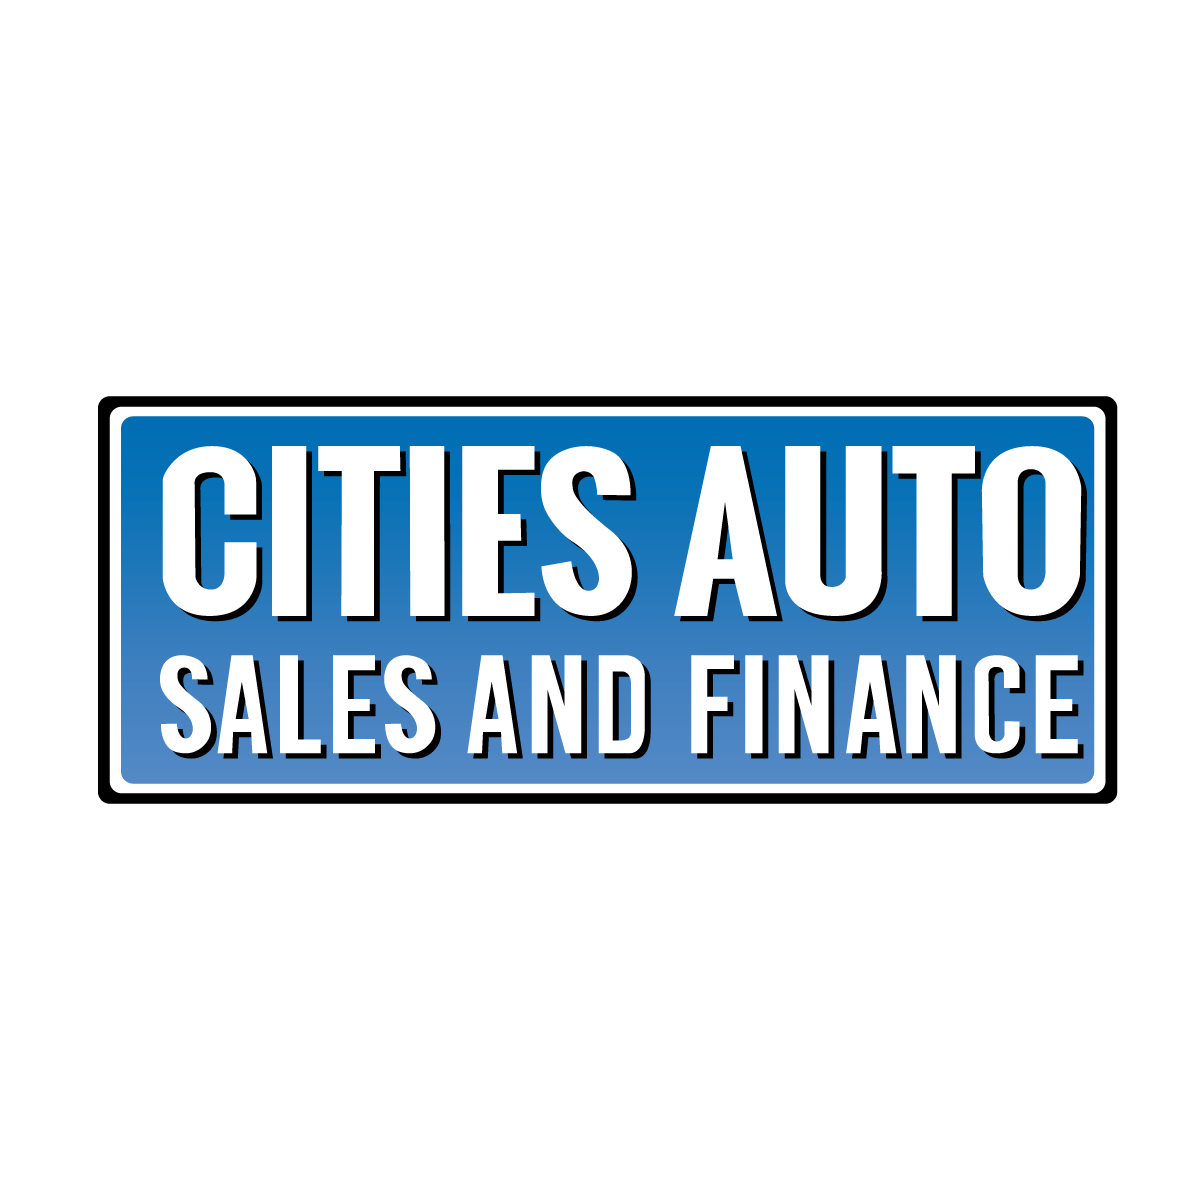 Cities Auto Sales